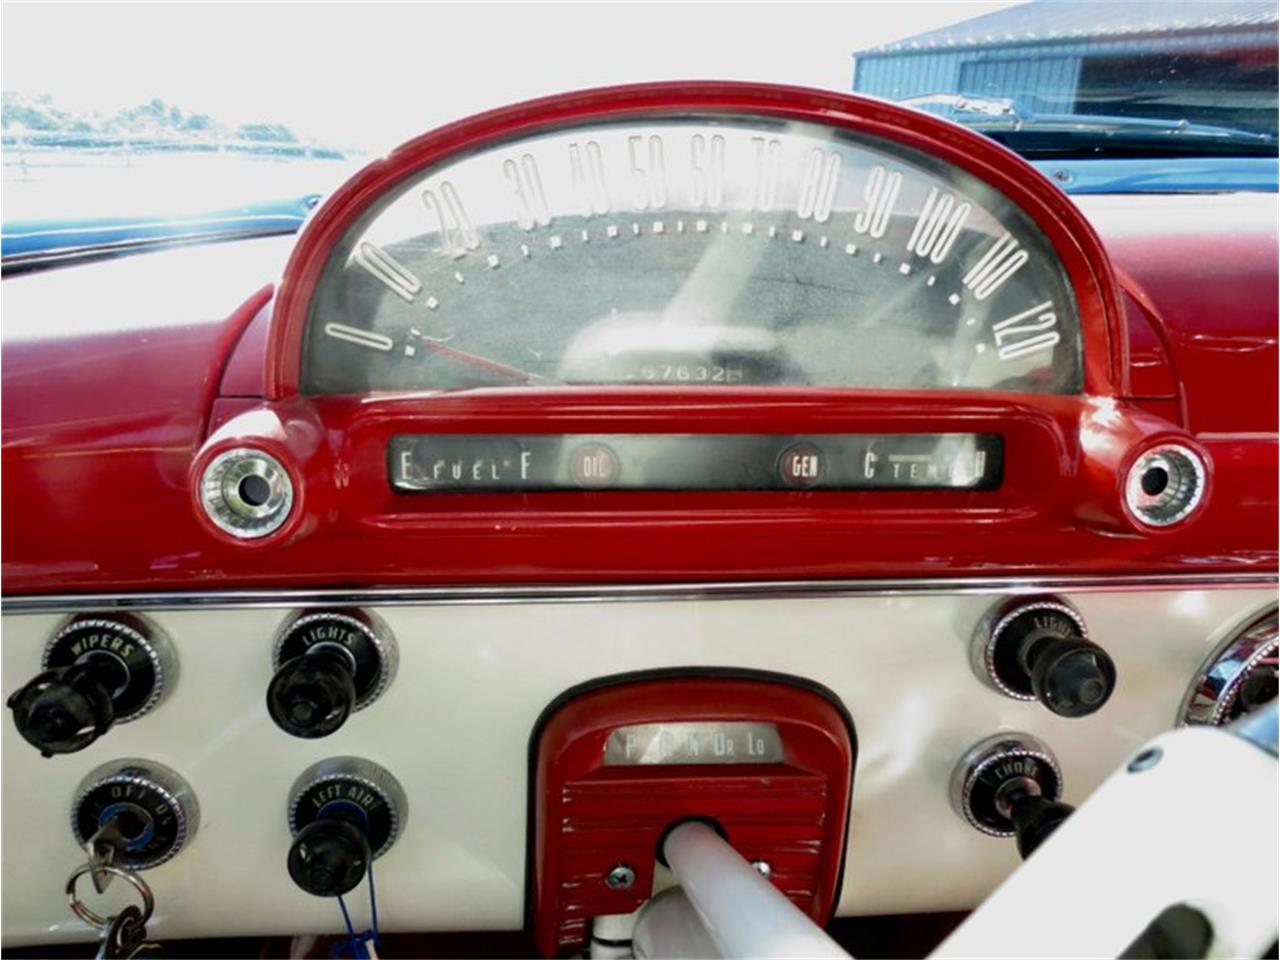 Large Picture of Classic 1955 Ford Fairlane located in Dayton Ohio - QU8Q